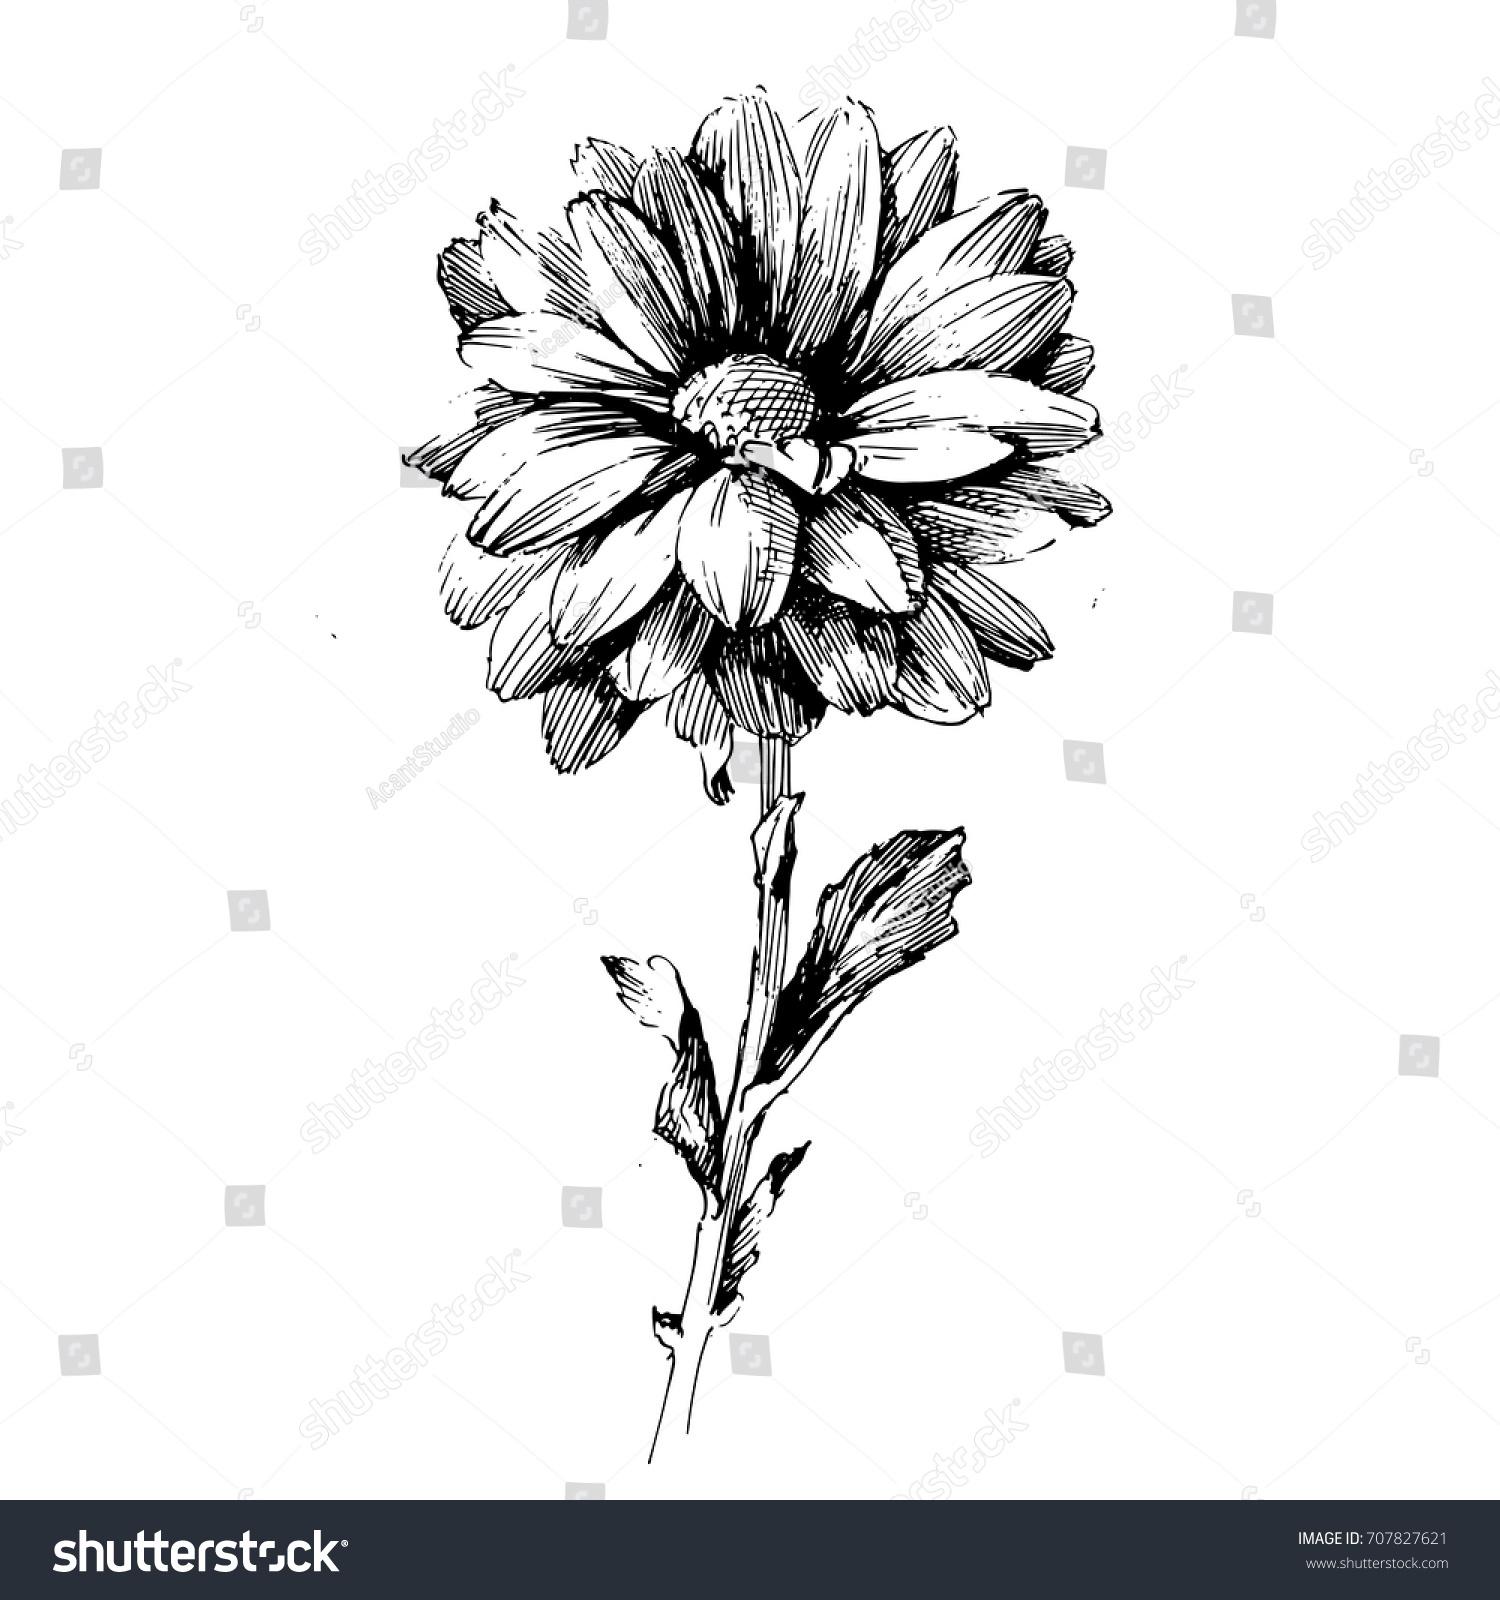 Chrysanthemum Flower Line Drawing : Chrysanthemum ink drawing flower vector illustration stock